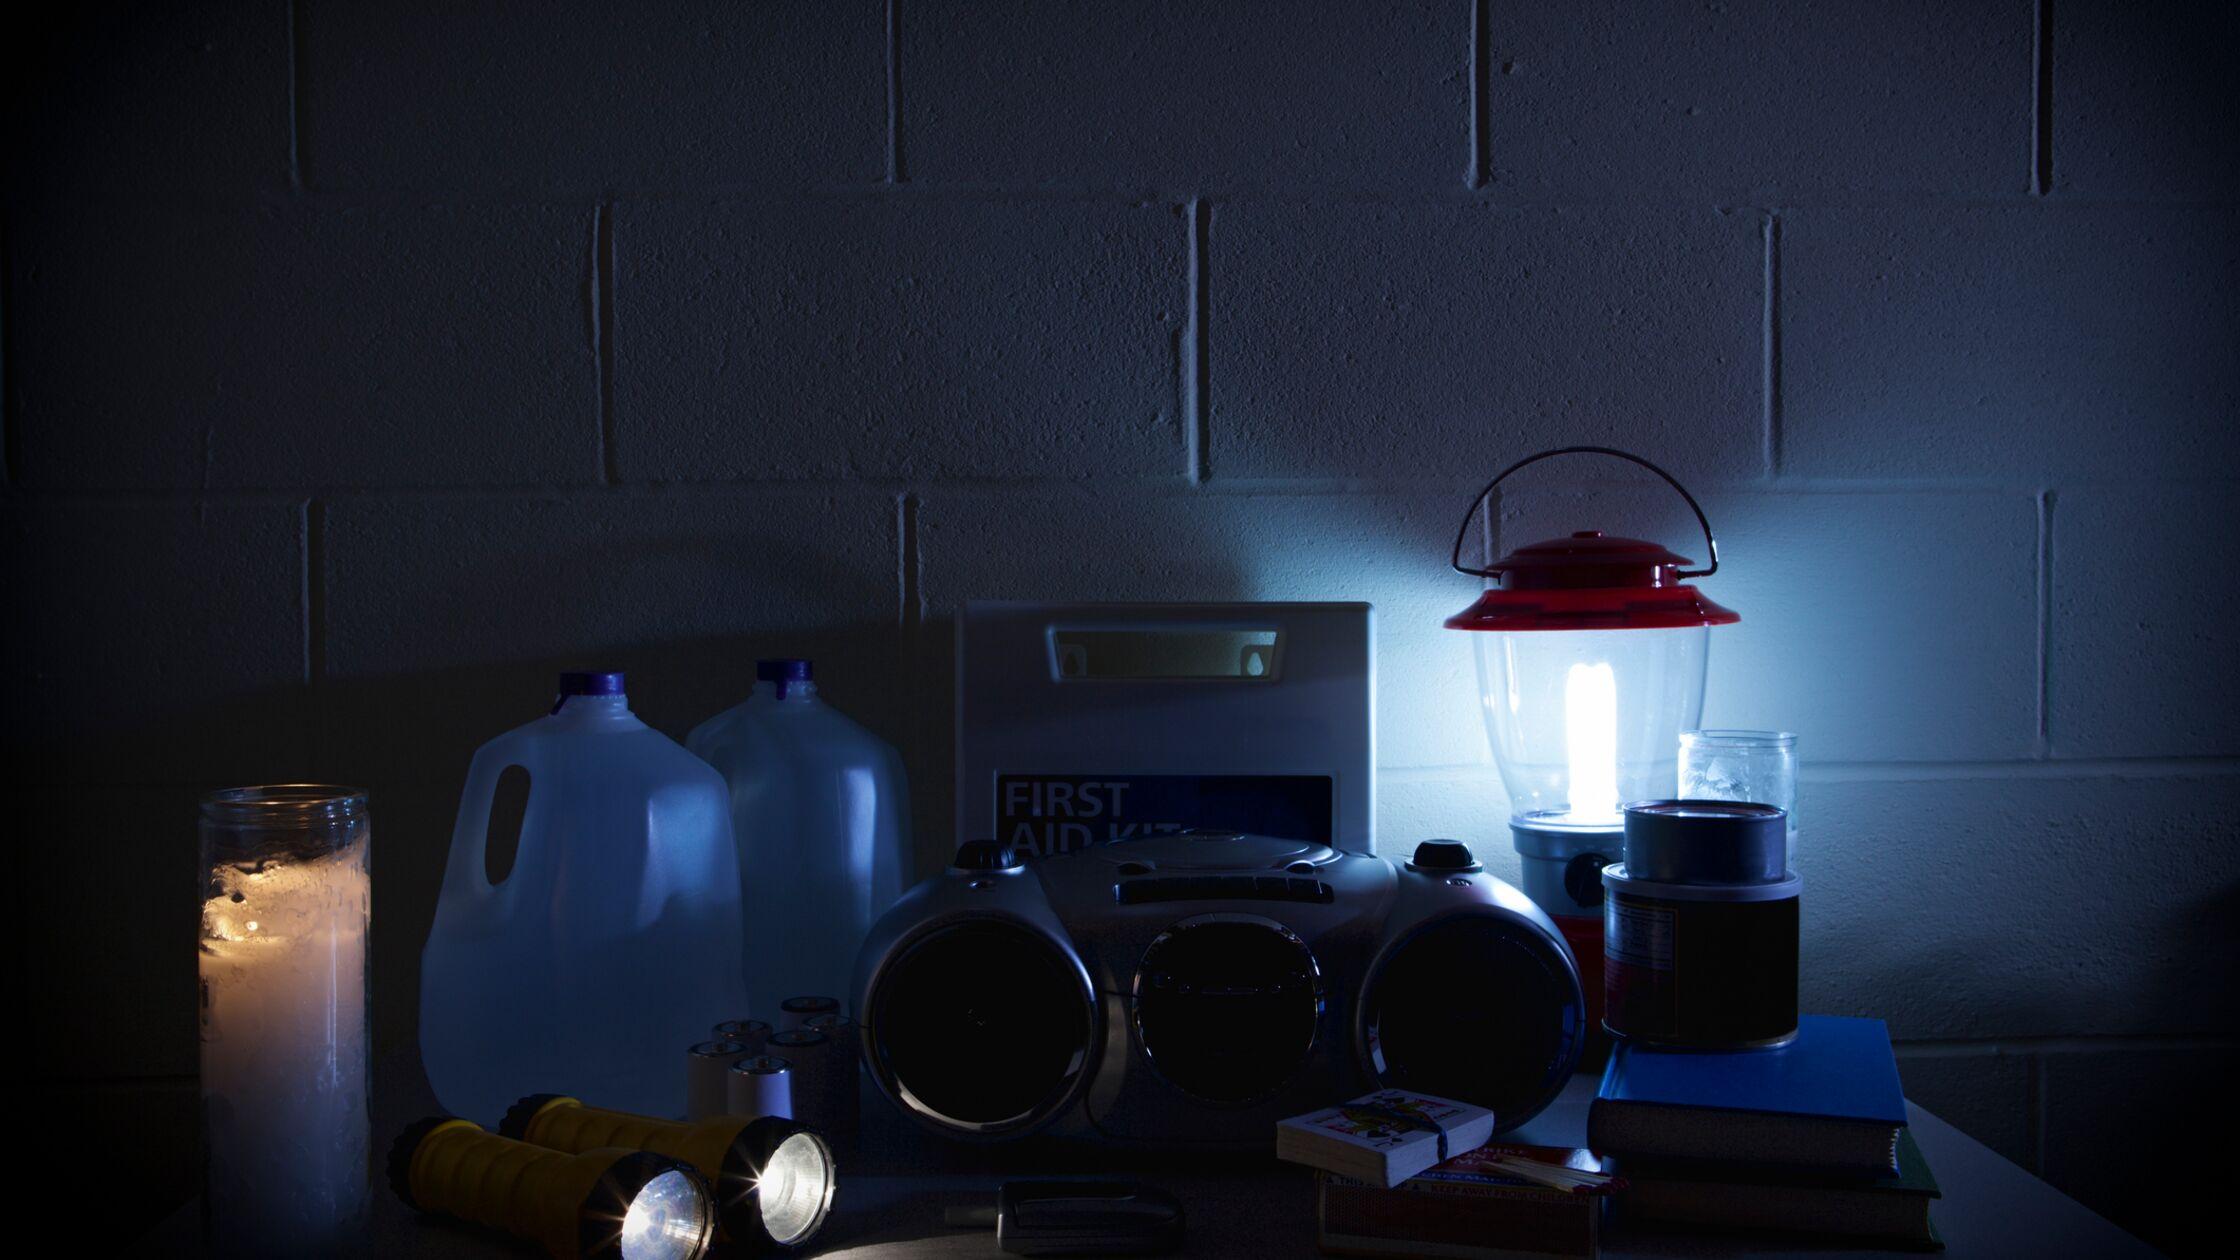 Notfallset bei Stromausfall. Taschenlampen, Batterien, Radio etc.